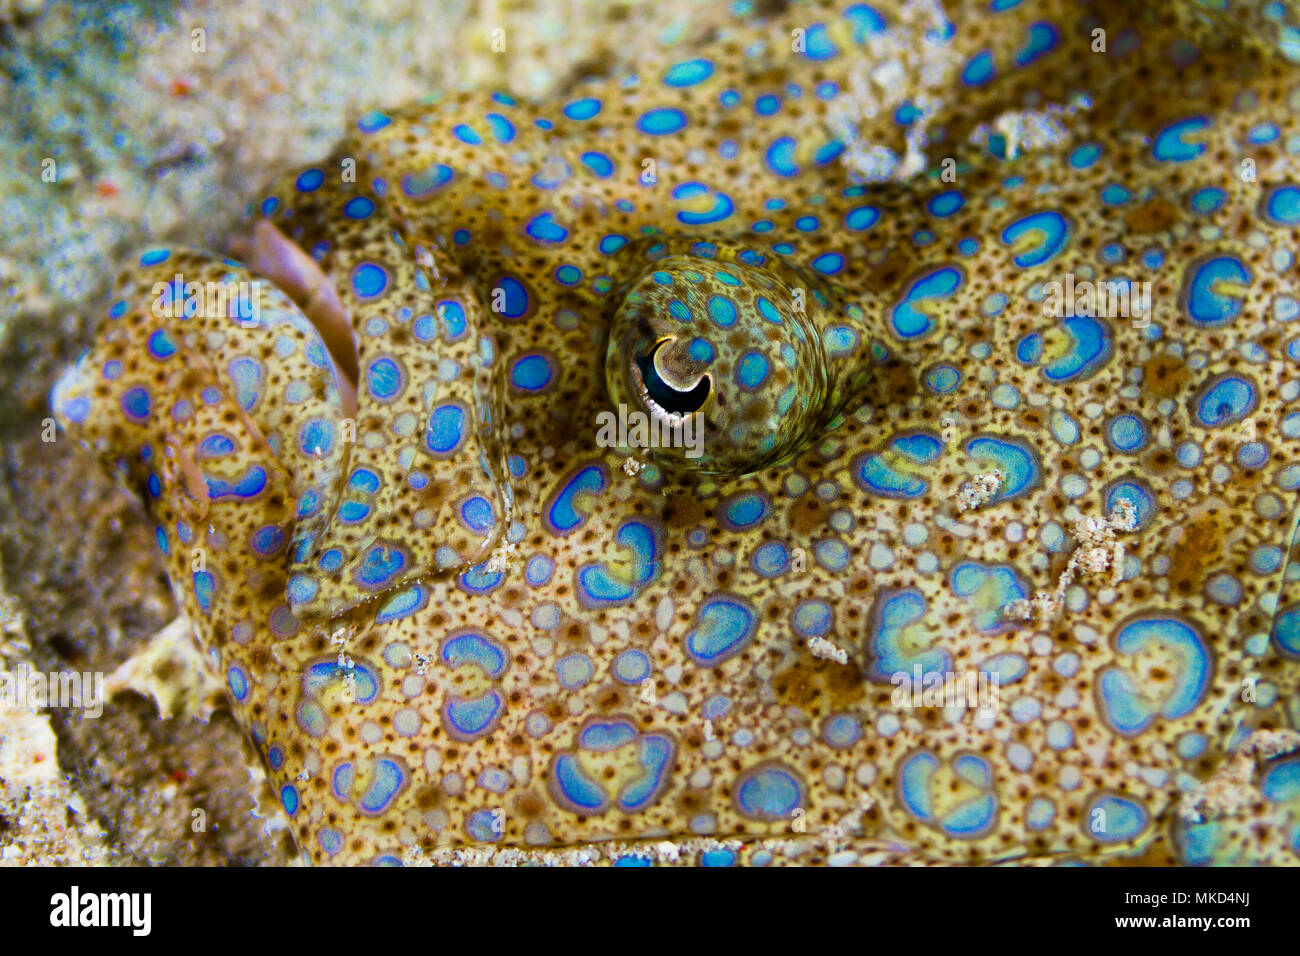 Vista anterior de una platija (Flowerys Bothus mancus) Jefe de Tahití, Polinesia Francesa Foto de stock